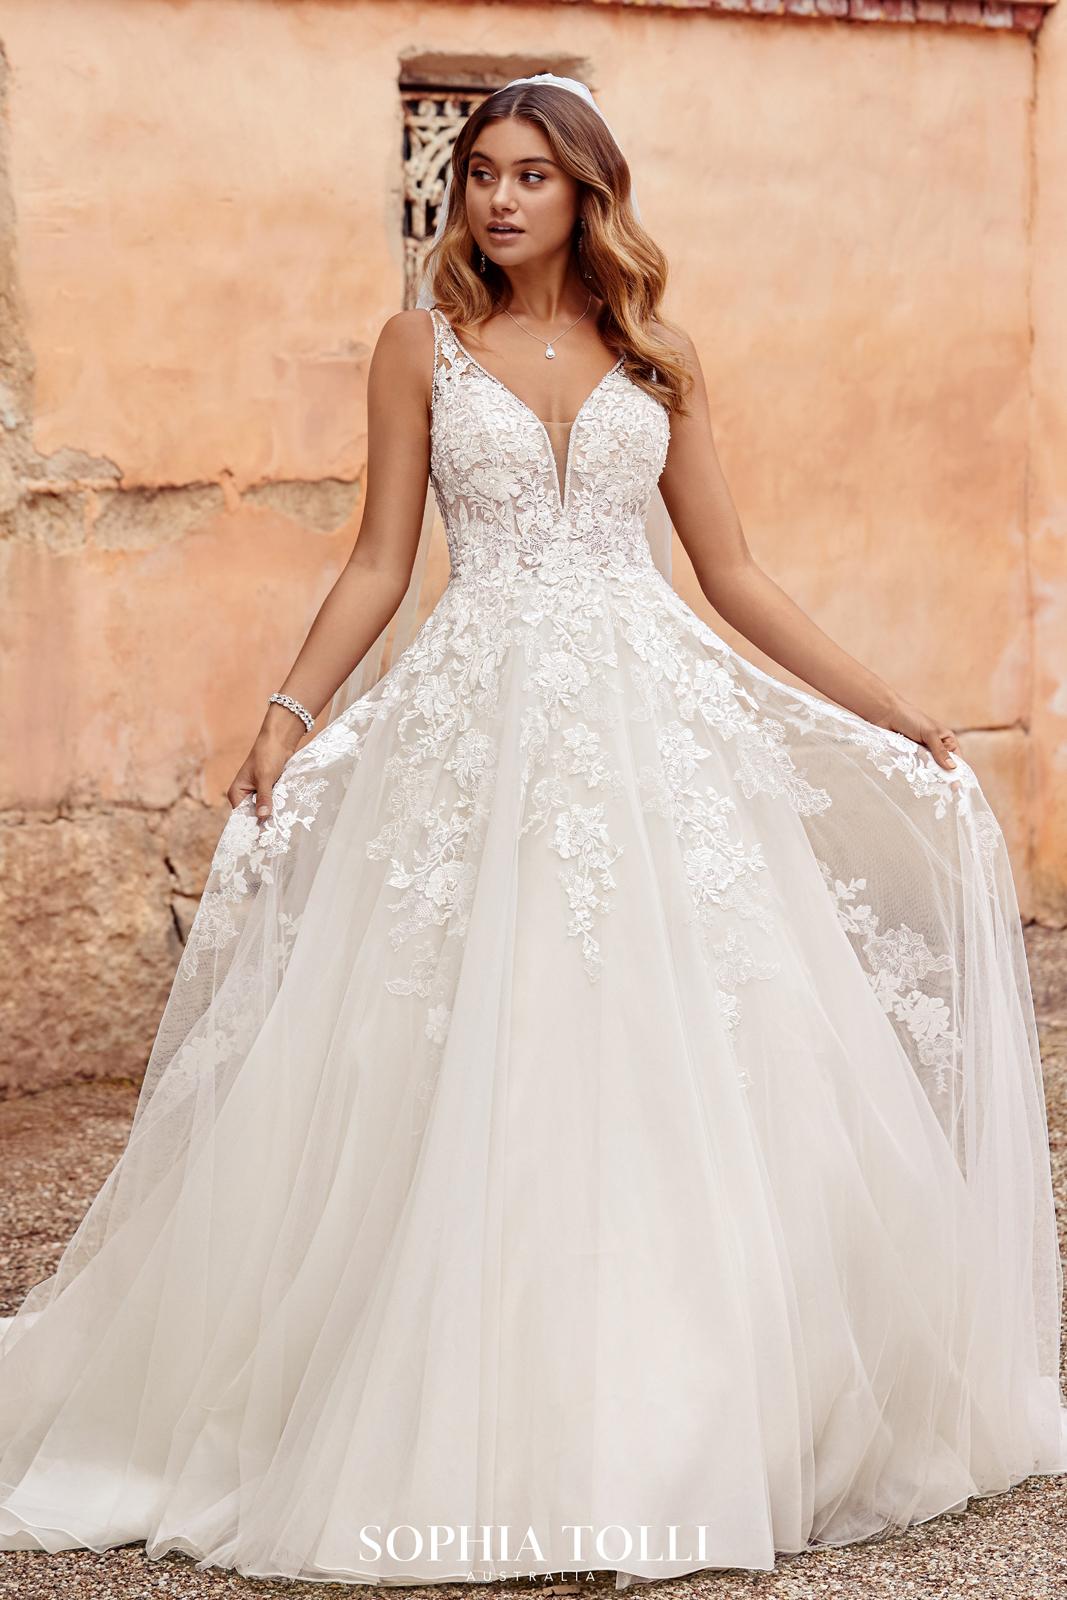 Sophia Tolli Y18 Evelyn Beaded V Neck Bridal Gown